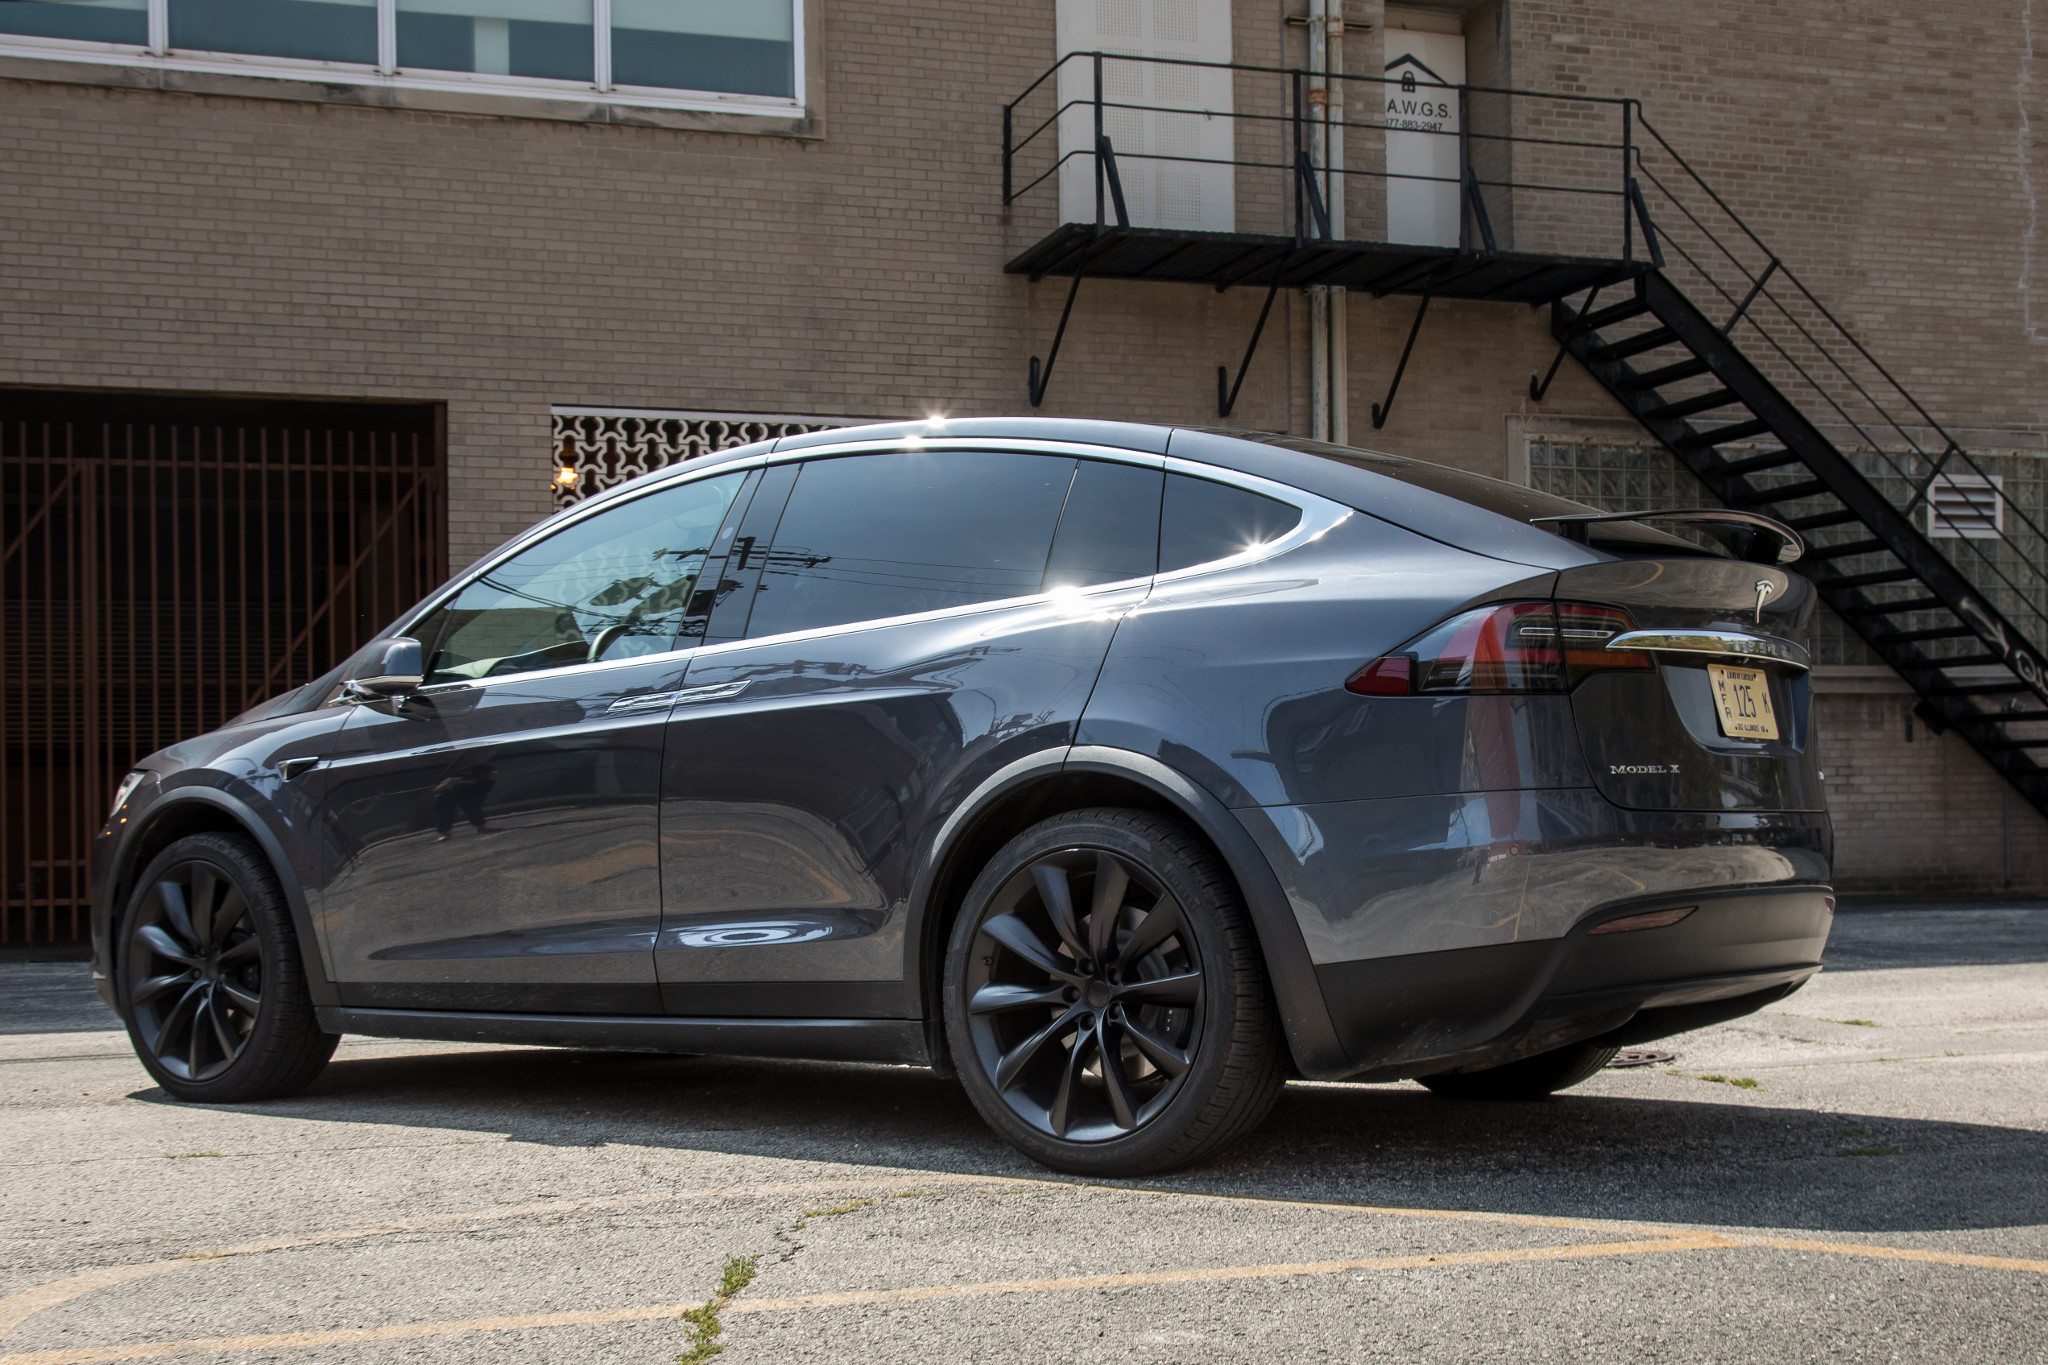 23-tesla-model-x-2018-exterior--grey--rear-angle.jpg